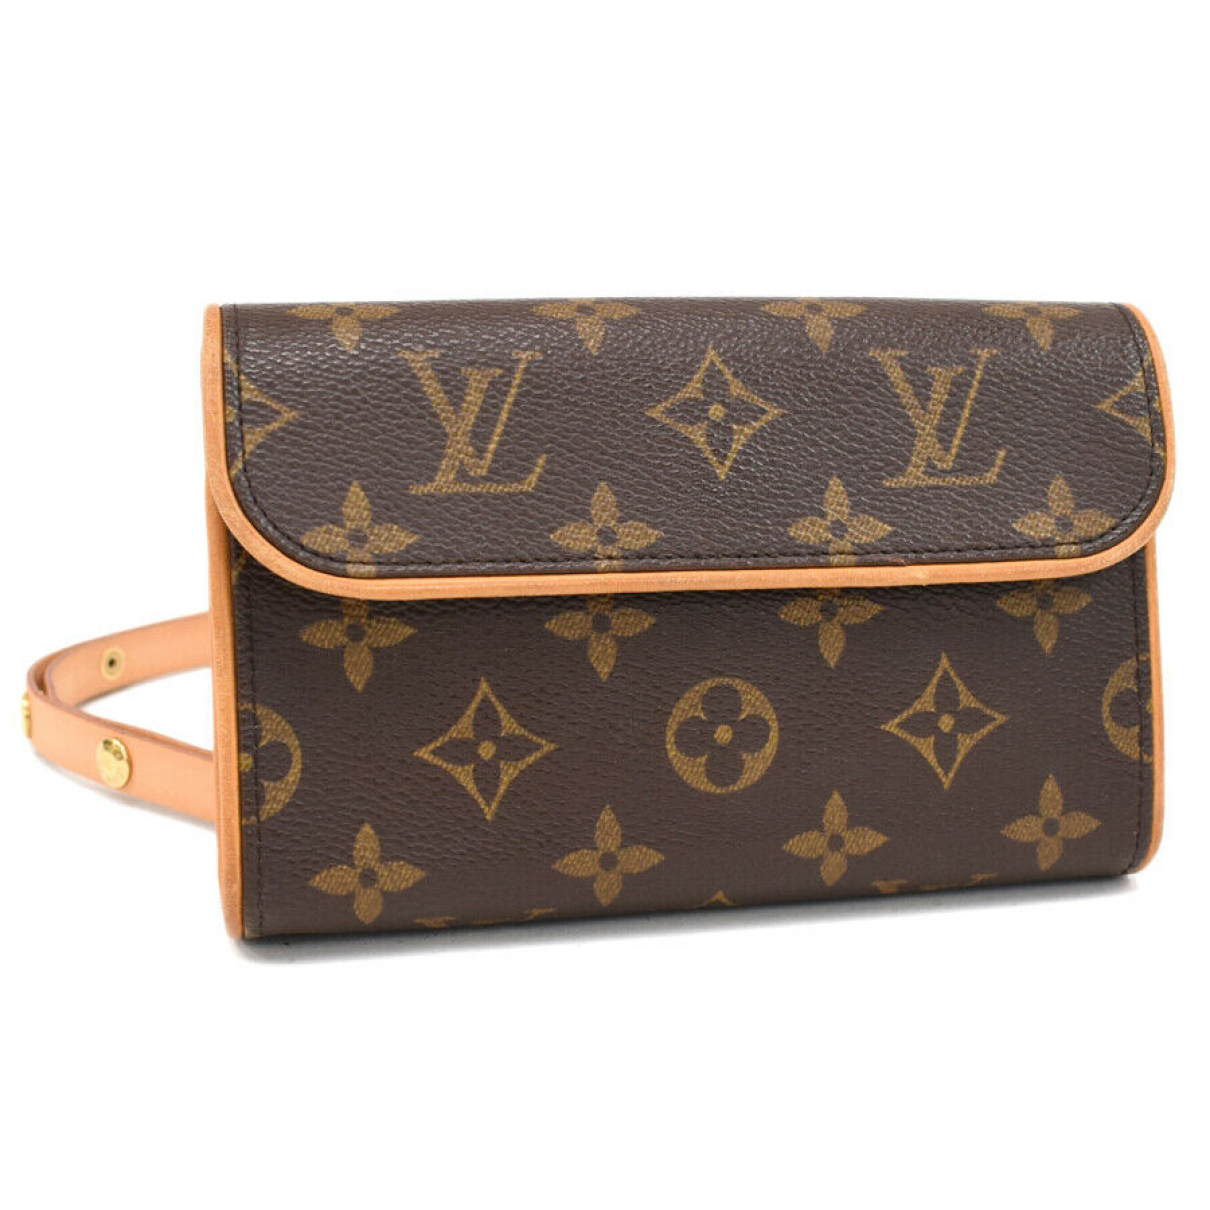 Mochila de Cuero Louis Vuitton